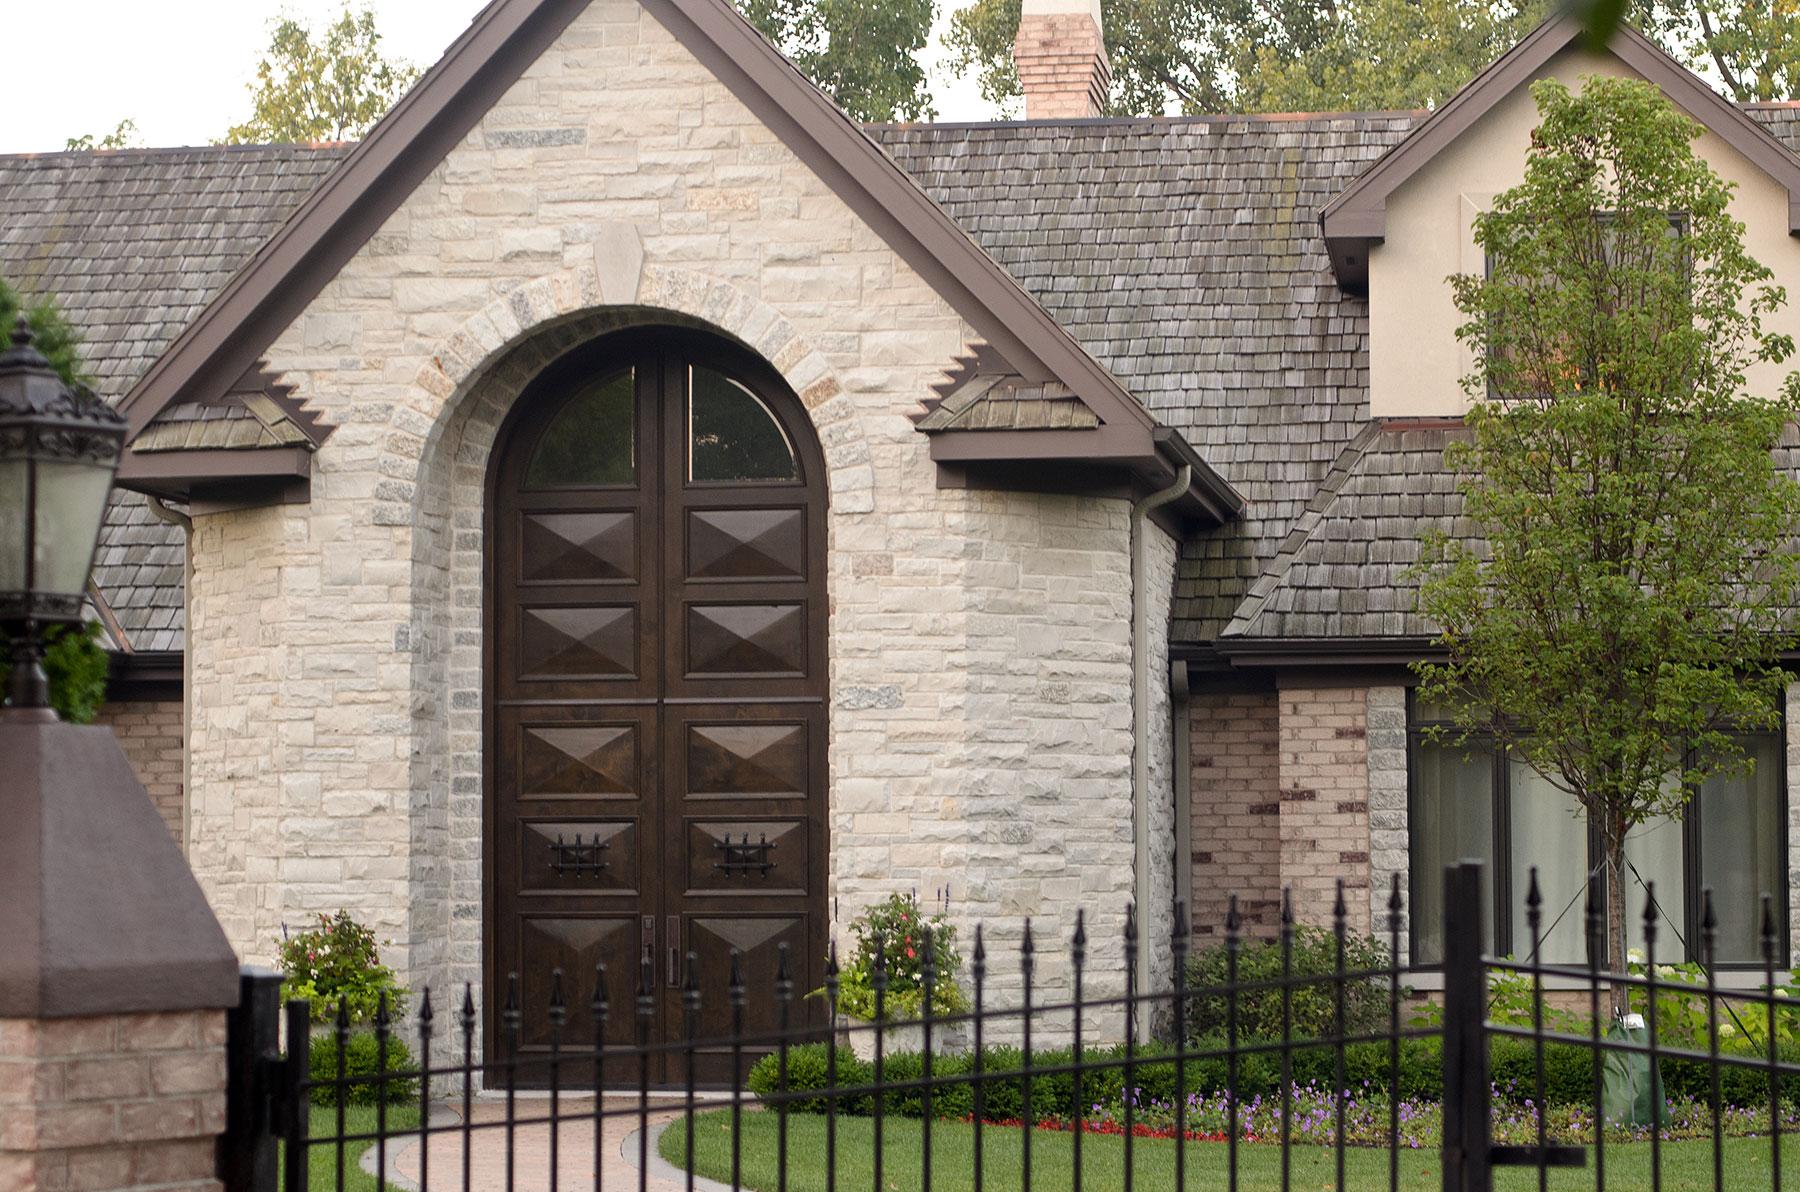 Custom Wood Front Entry Doors | Custom Solid Wood Mahogany Double Door with Transom, Rustic Collection  - Glenview Doors - Custom Doors in Chicago